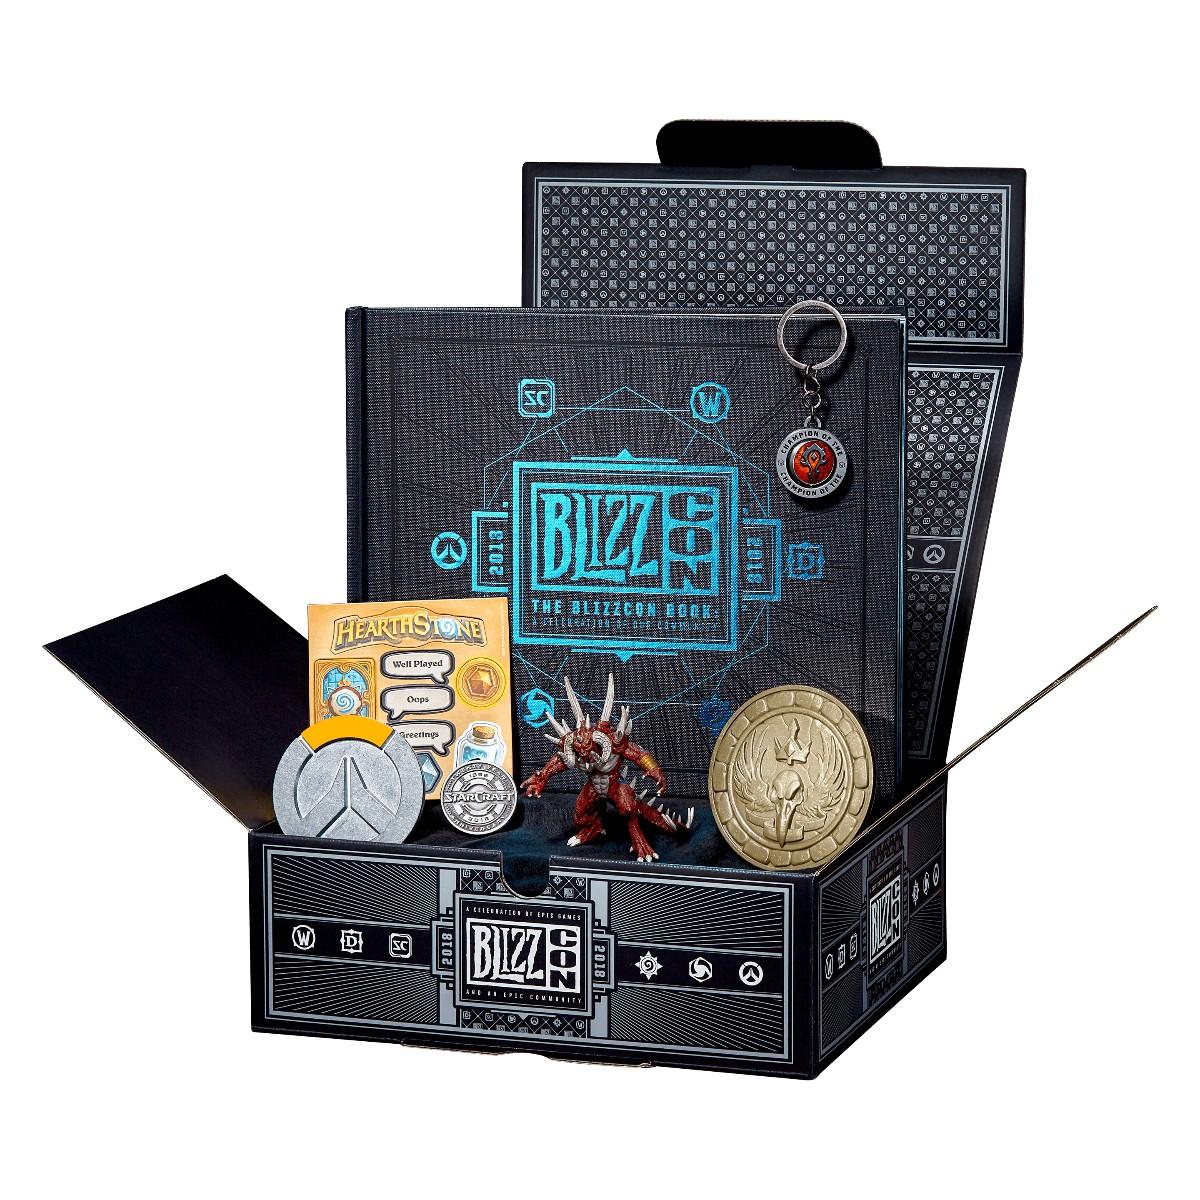 Blizzard gear tracking